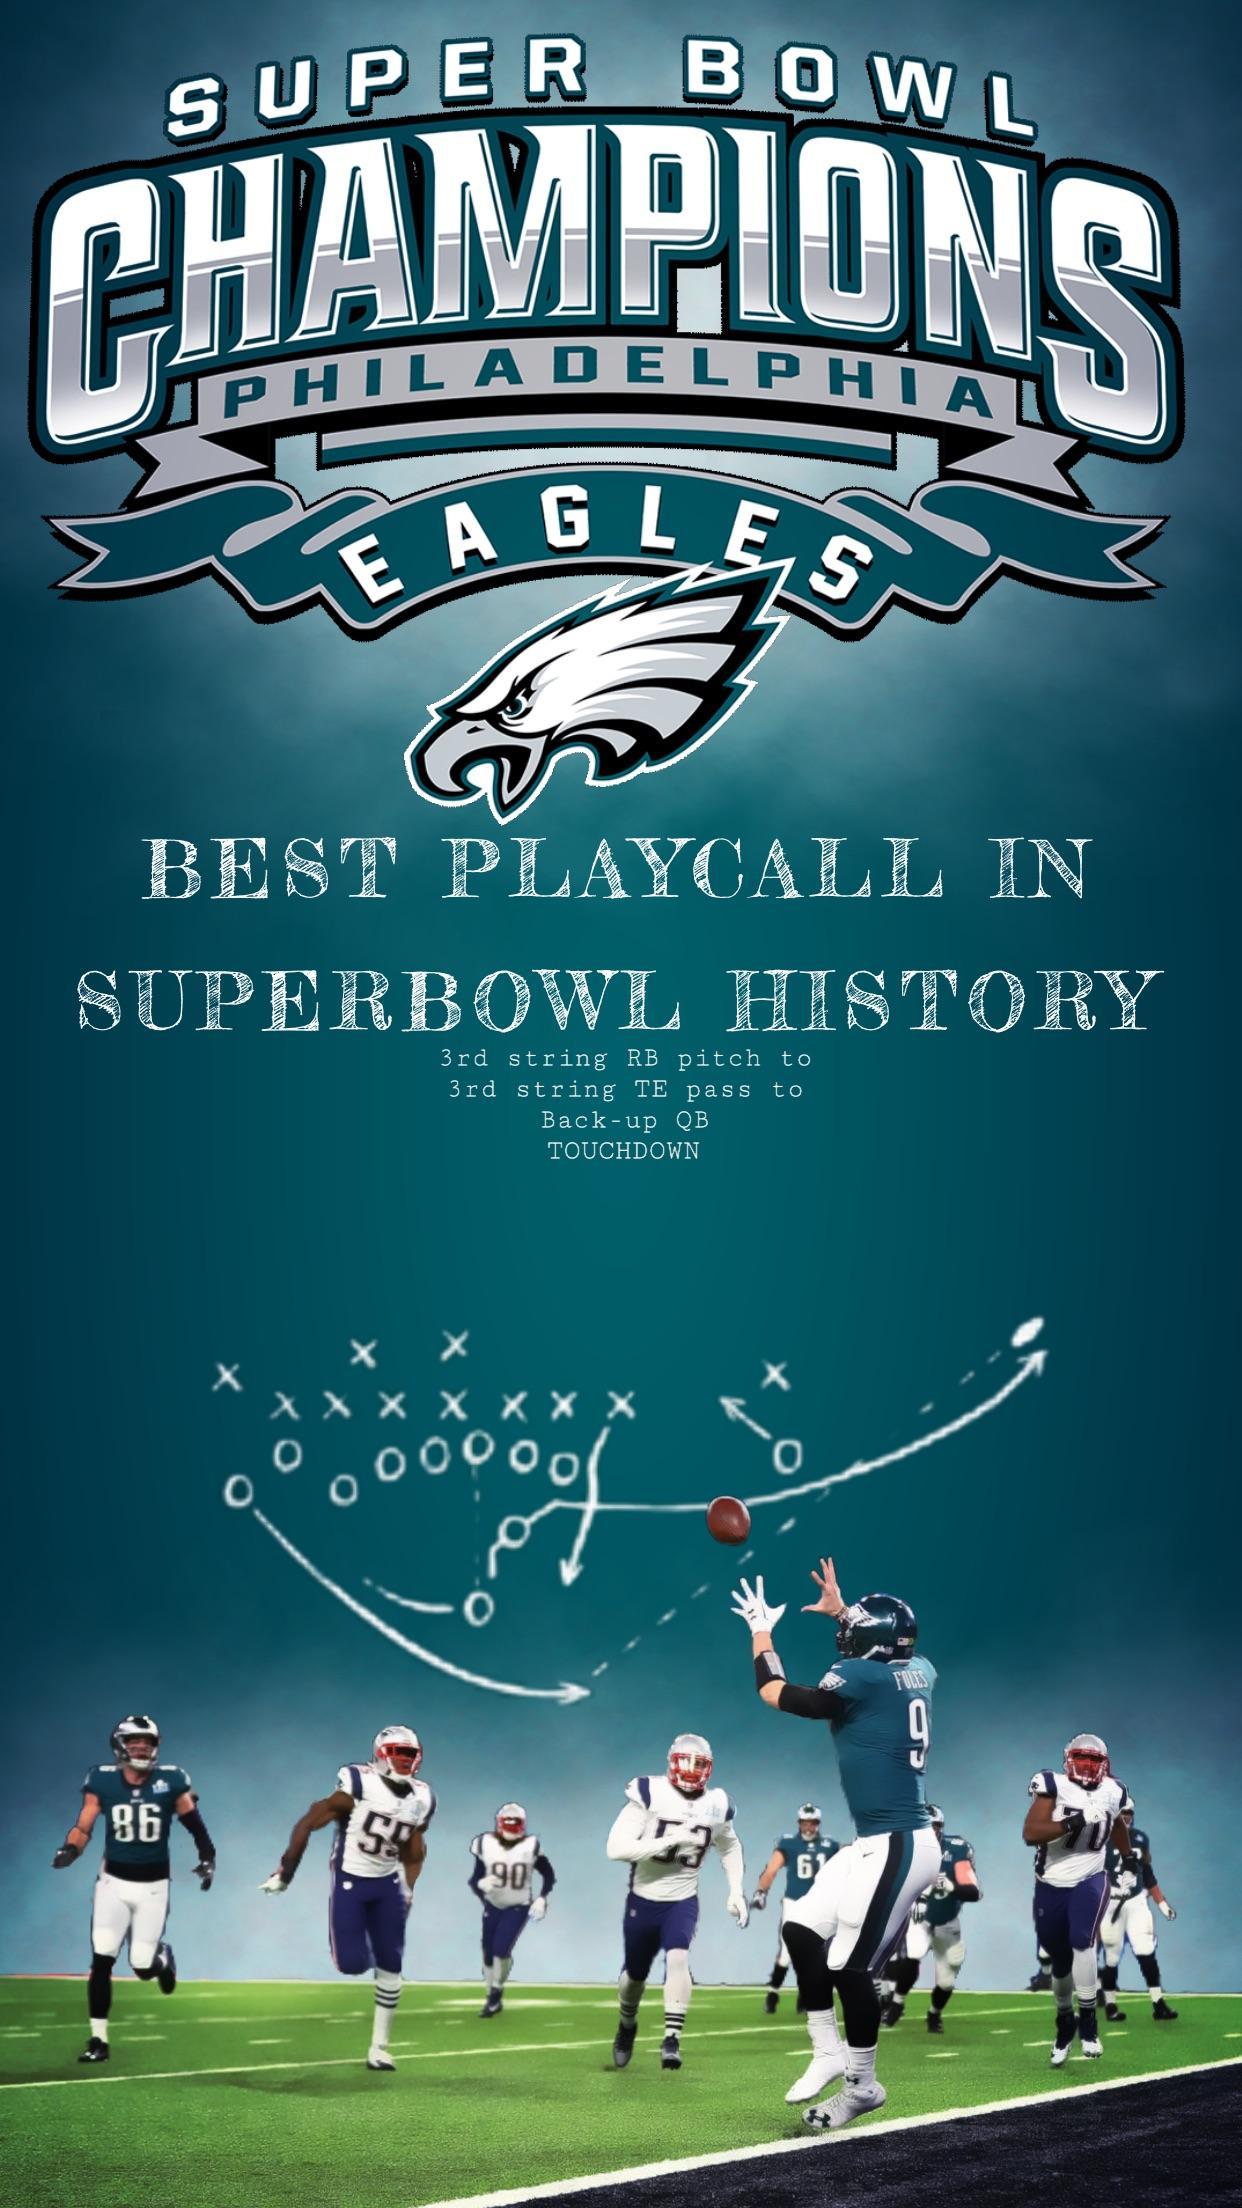 Download Eagles Super Bowl Wallpaper Hd Backgrounds